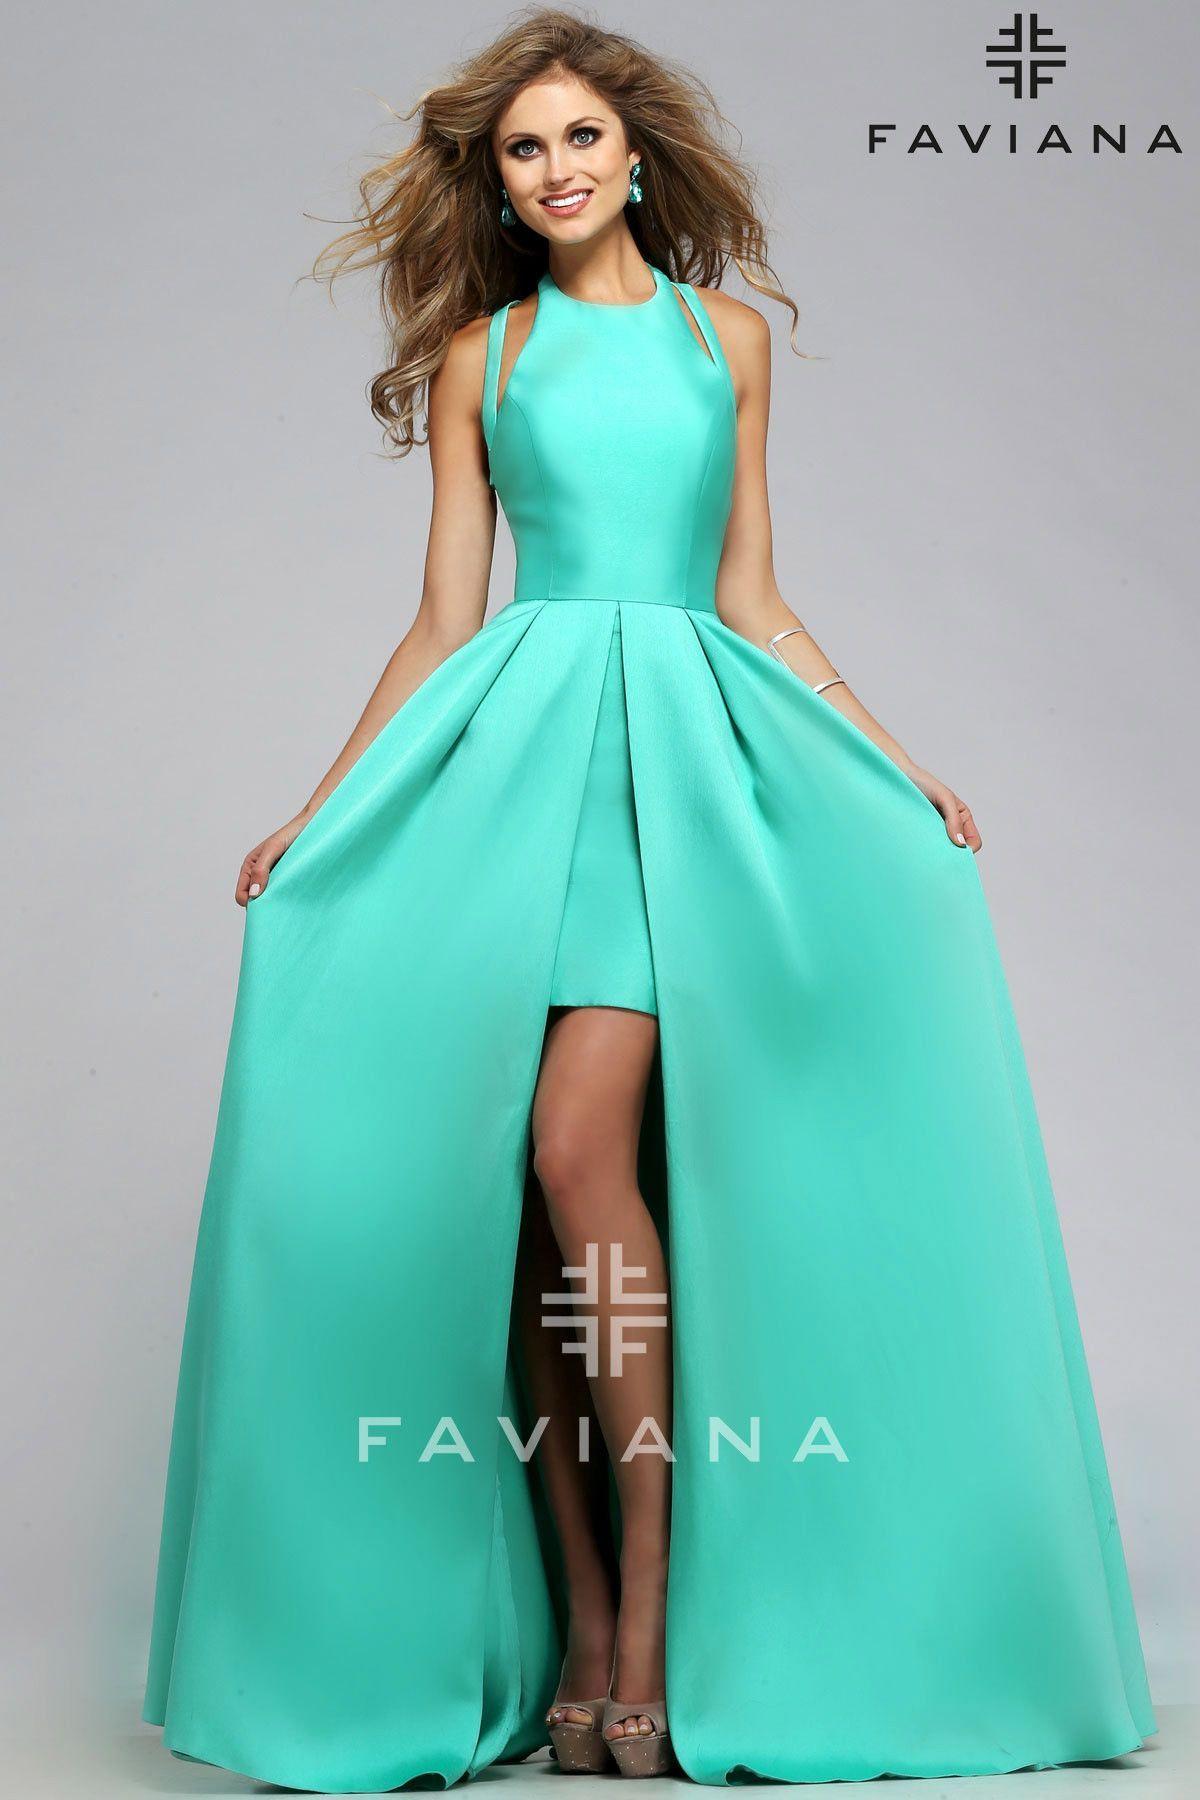 Faviana prom dress style 7752 | Dresses | Pinterest | Prom, Formal ...